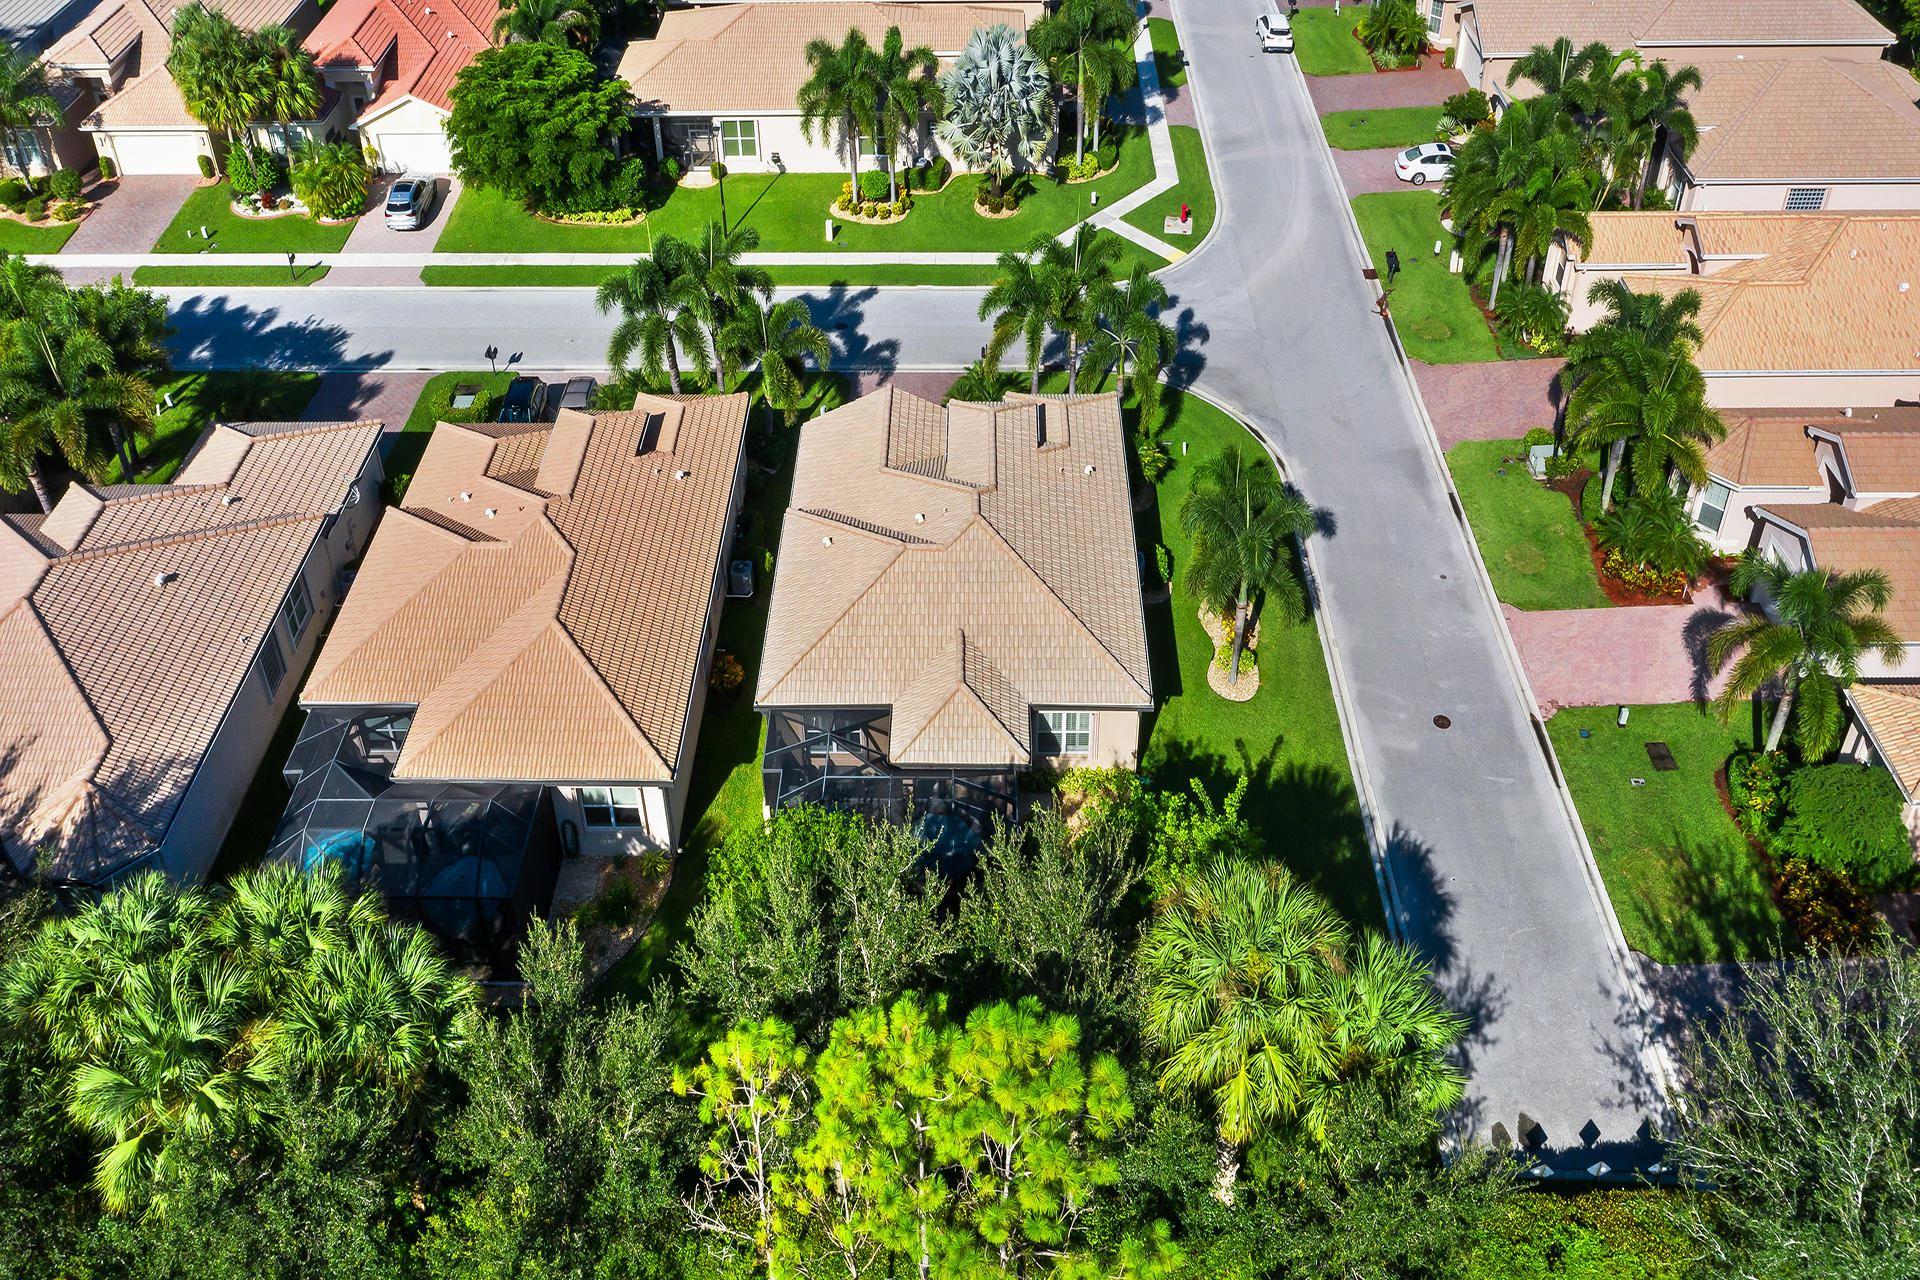 Photo of 10540 Stone Garden Drive, Boynton Beach, FL 33473 (MLS # RX-10658032)